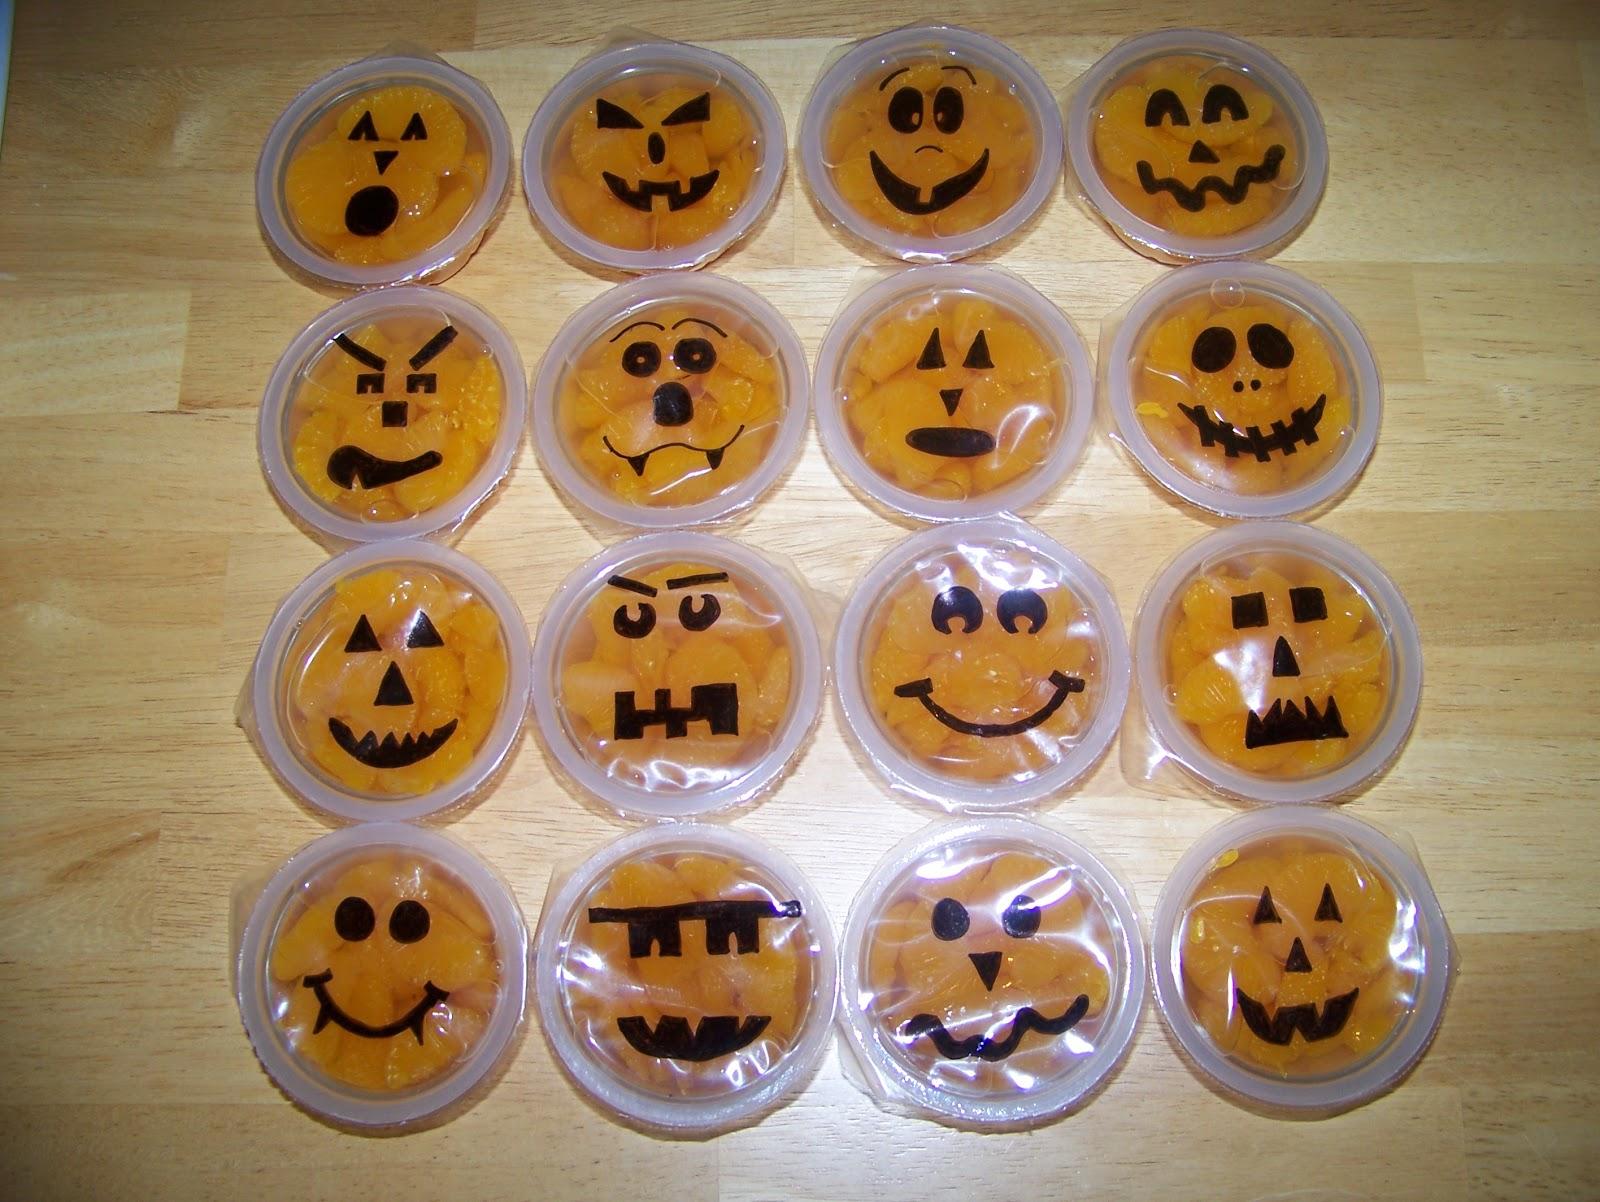 halloween snack idea making cooley stuff fruit cup halloween treats - Healthy Fun Halloween Snacks